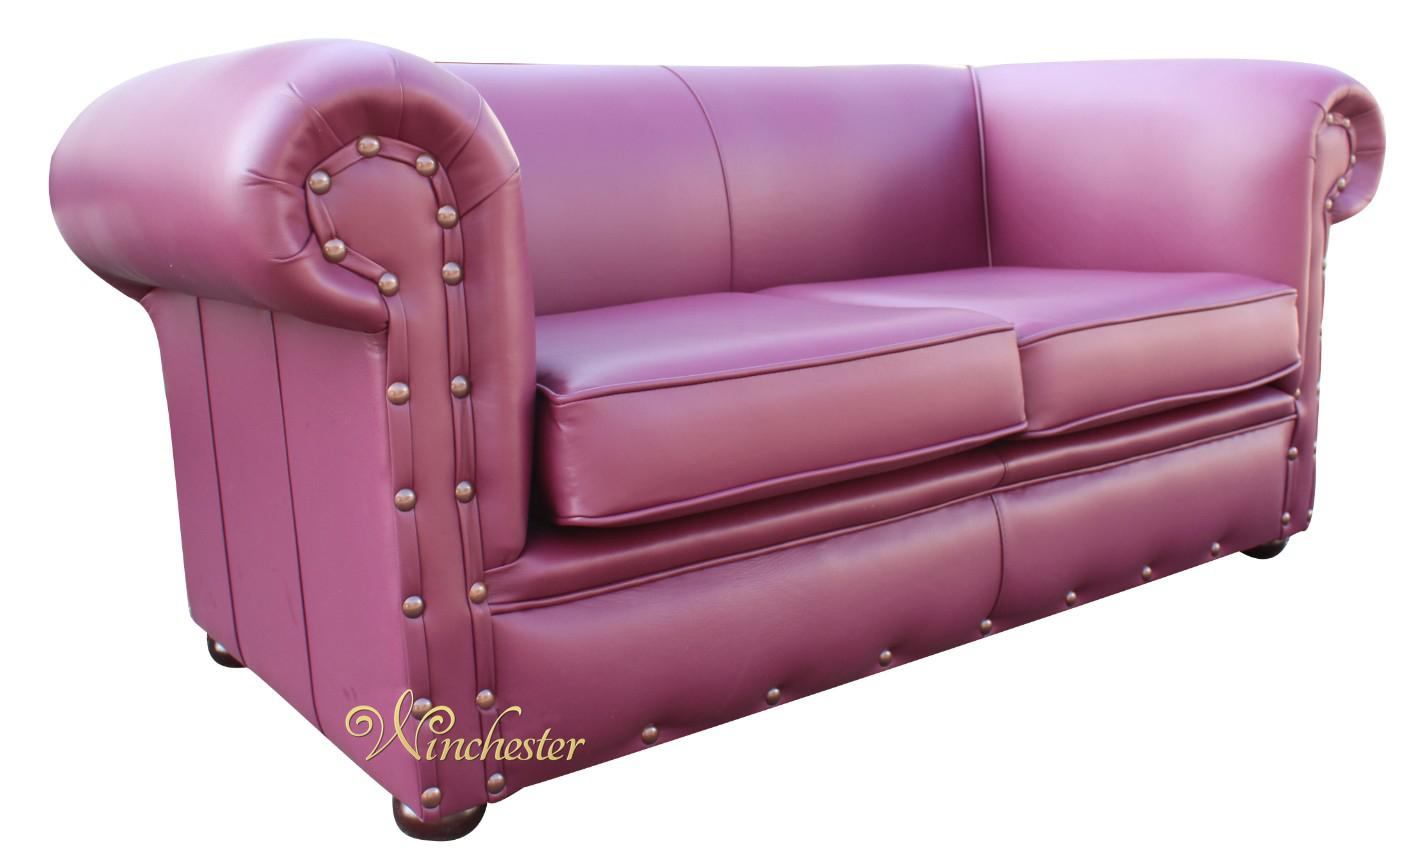 aubergine leather sofa best modern sectional chesterfield decor 2 seater settee vele